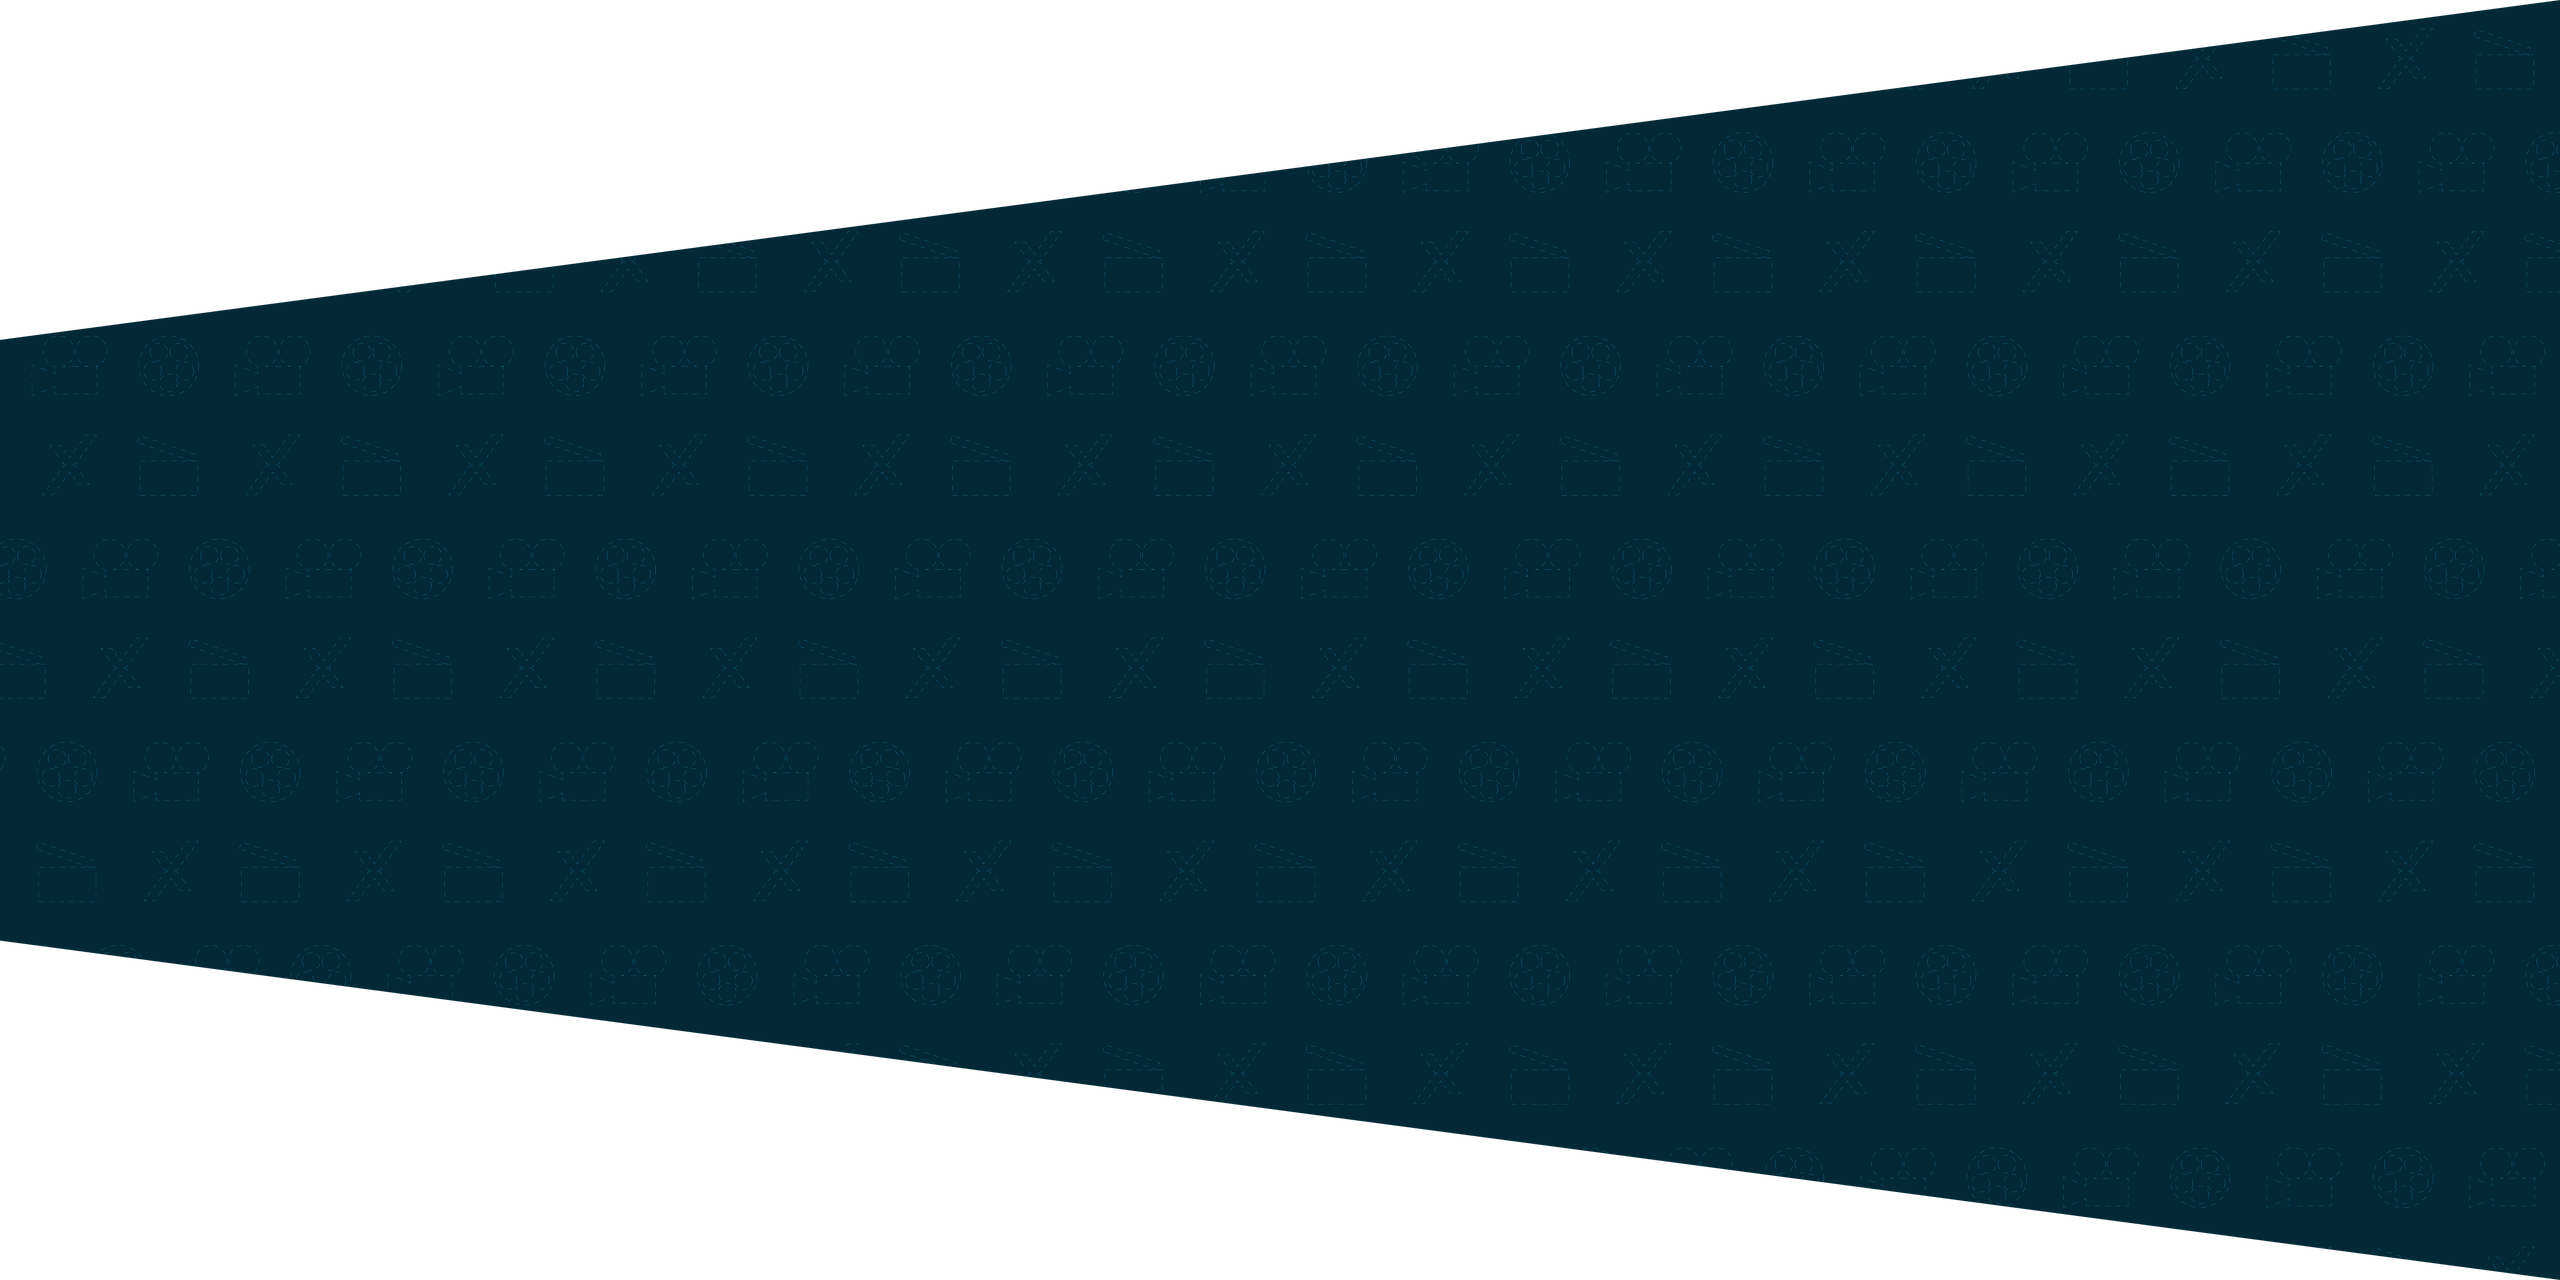 Schrägen_2x1_200613_1.png